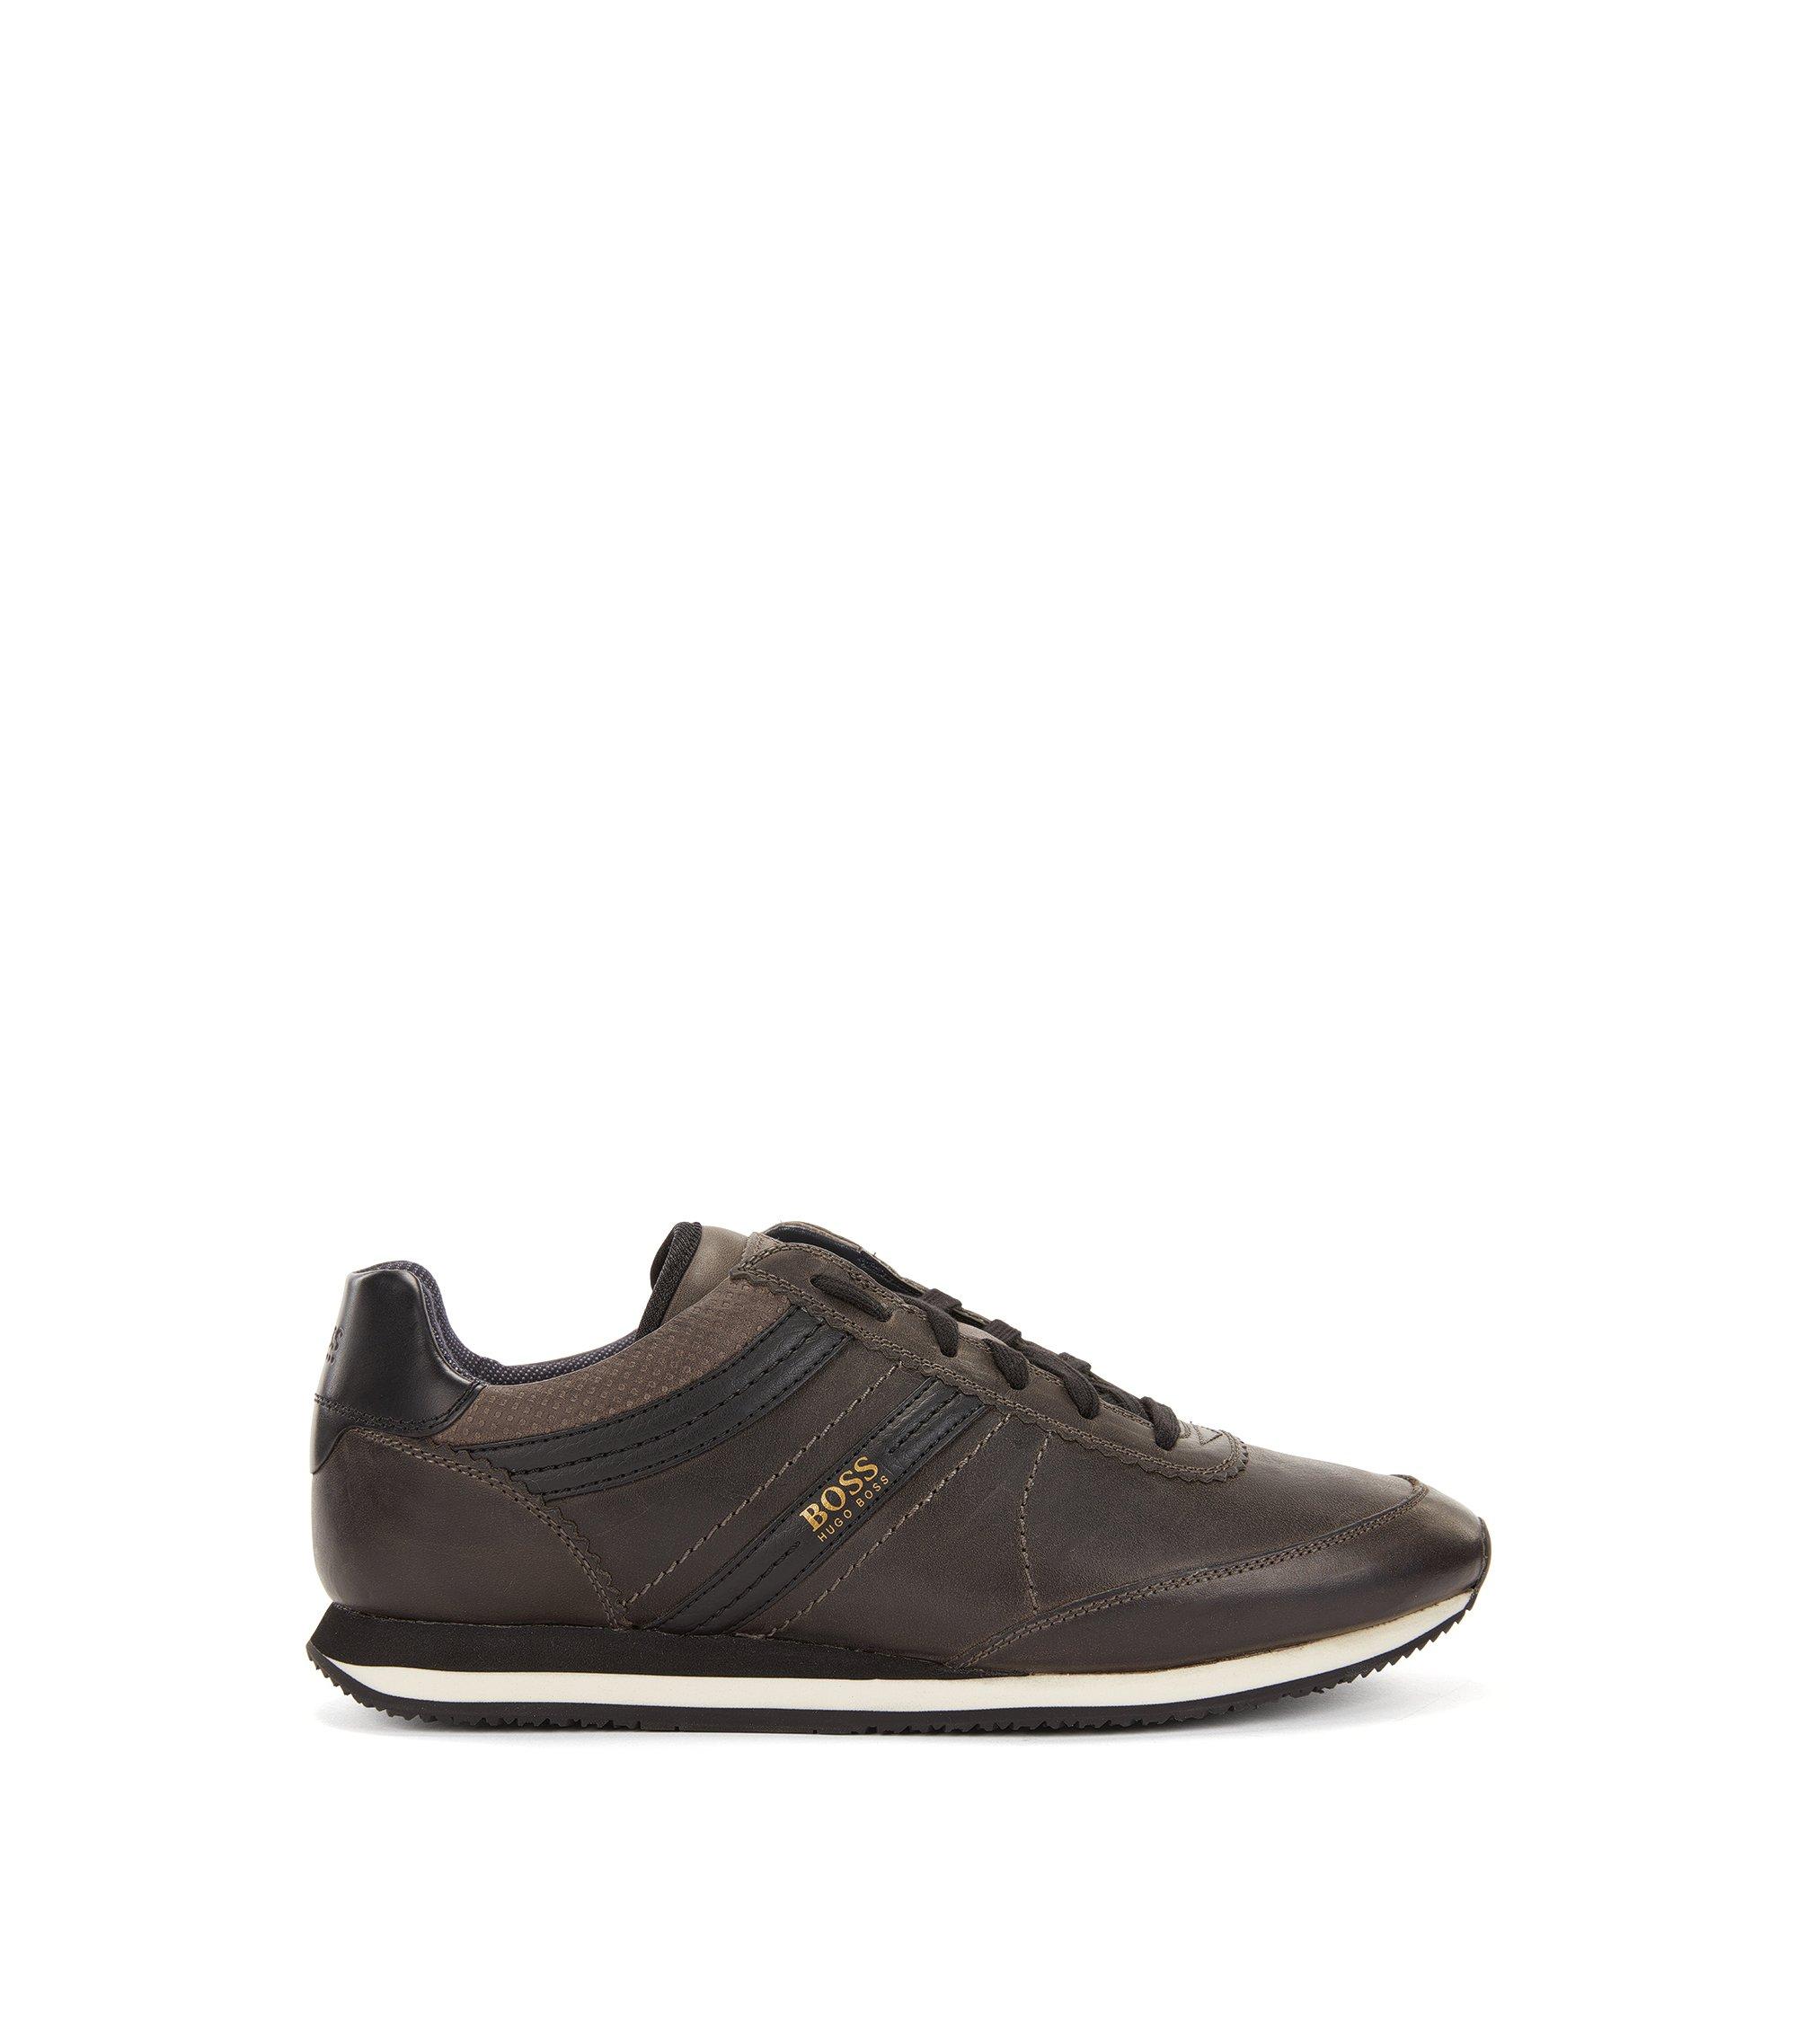 Sneakers aus Pull-Up-Leder mit EVA-Sohle, Schwarz